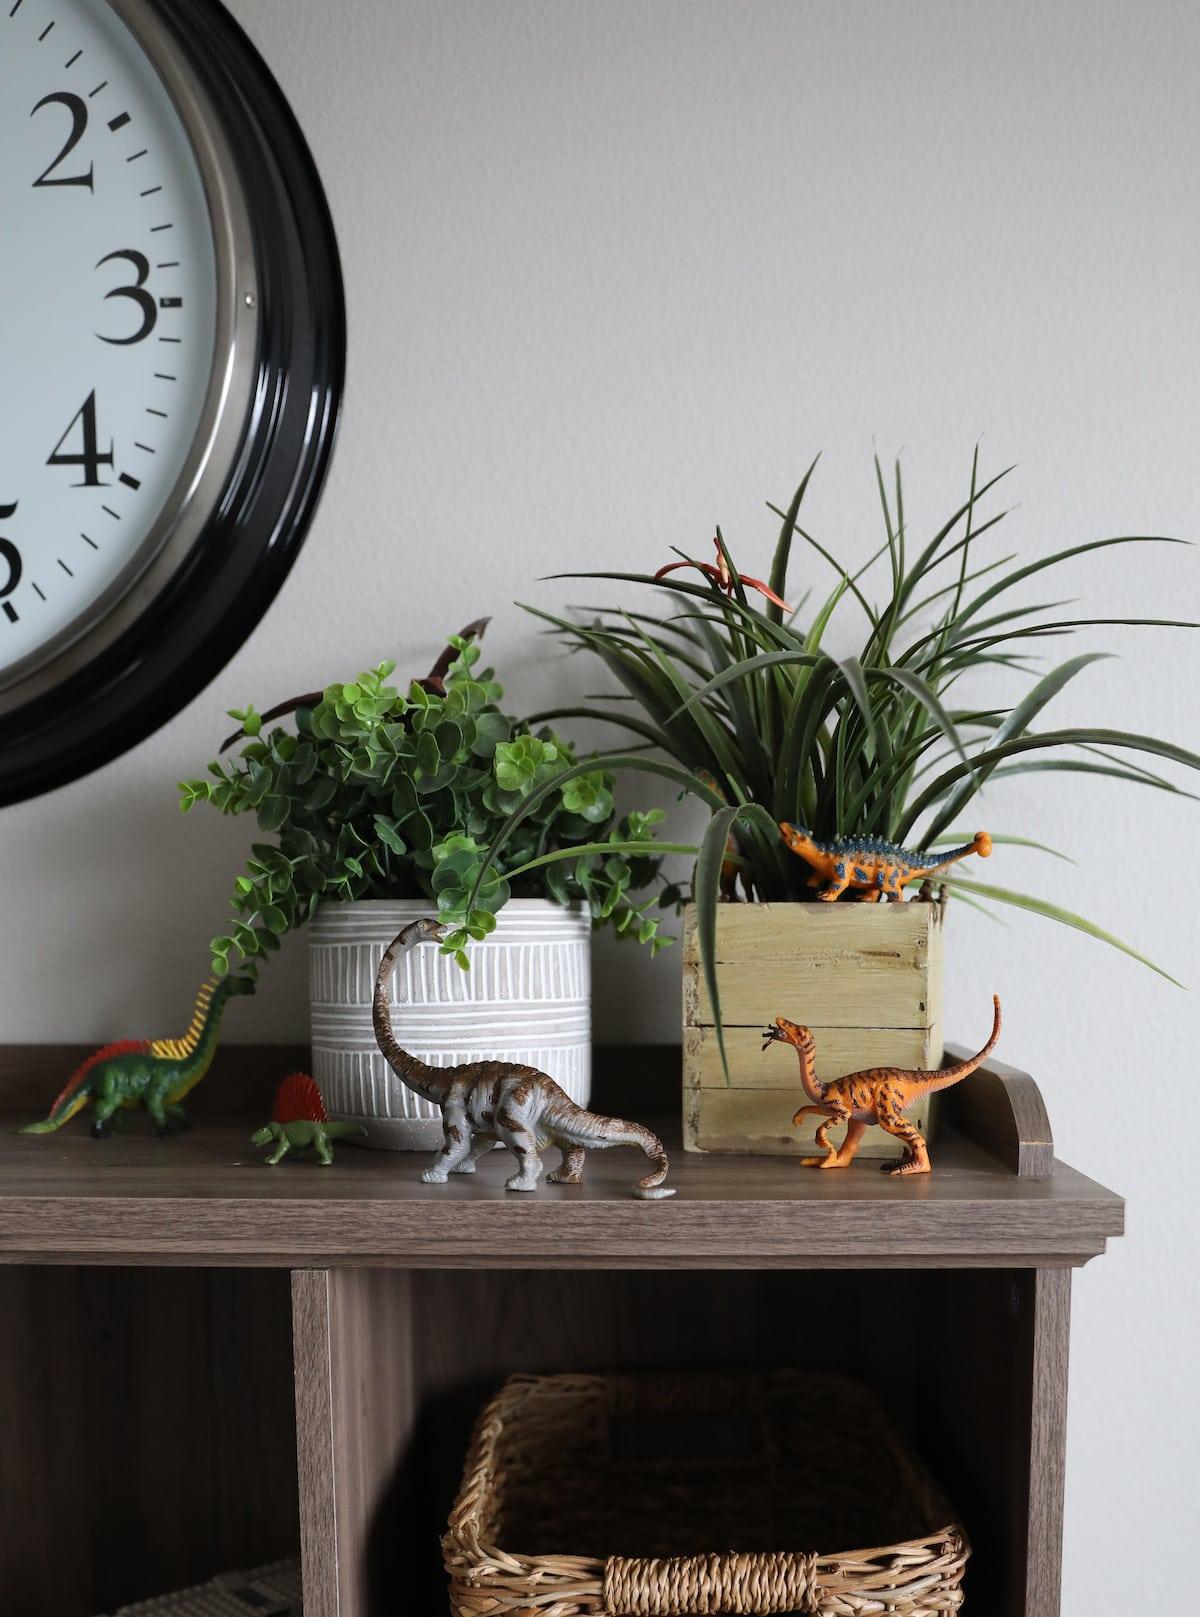 toy dinosaurs eating fake plants